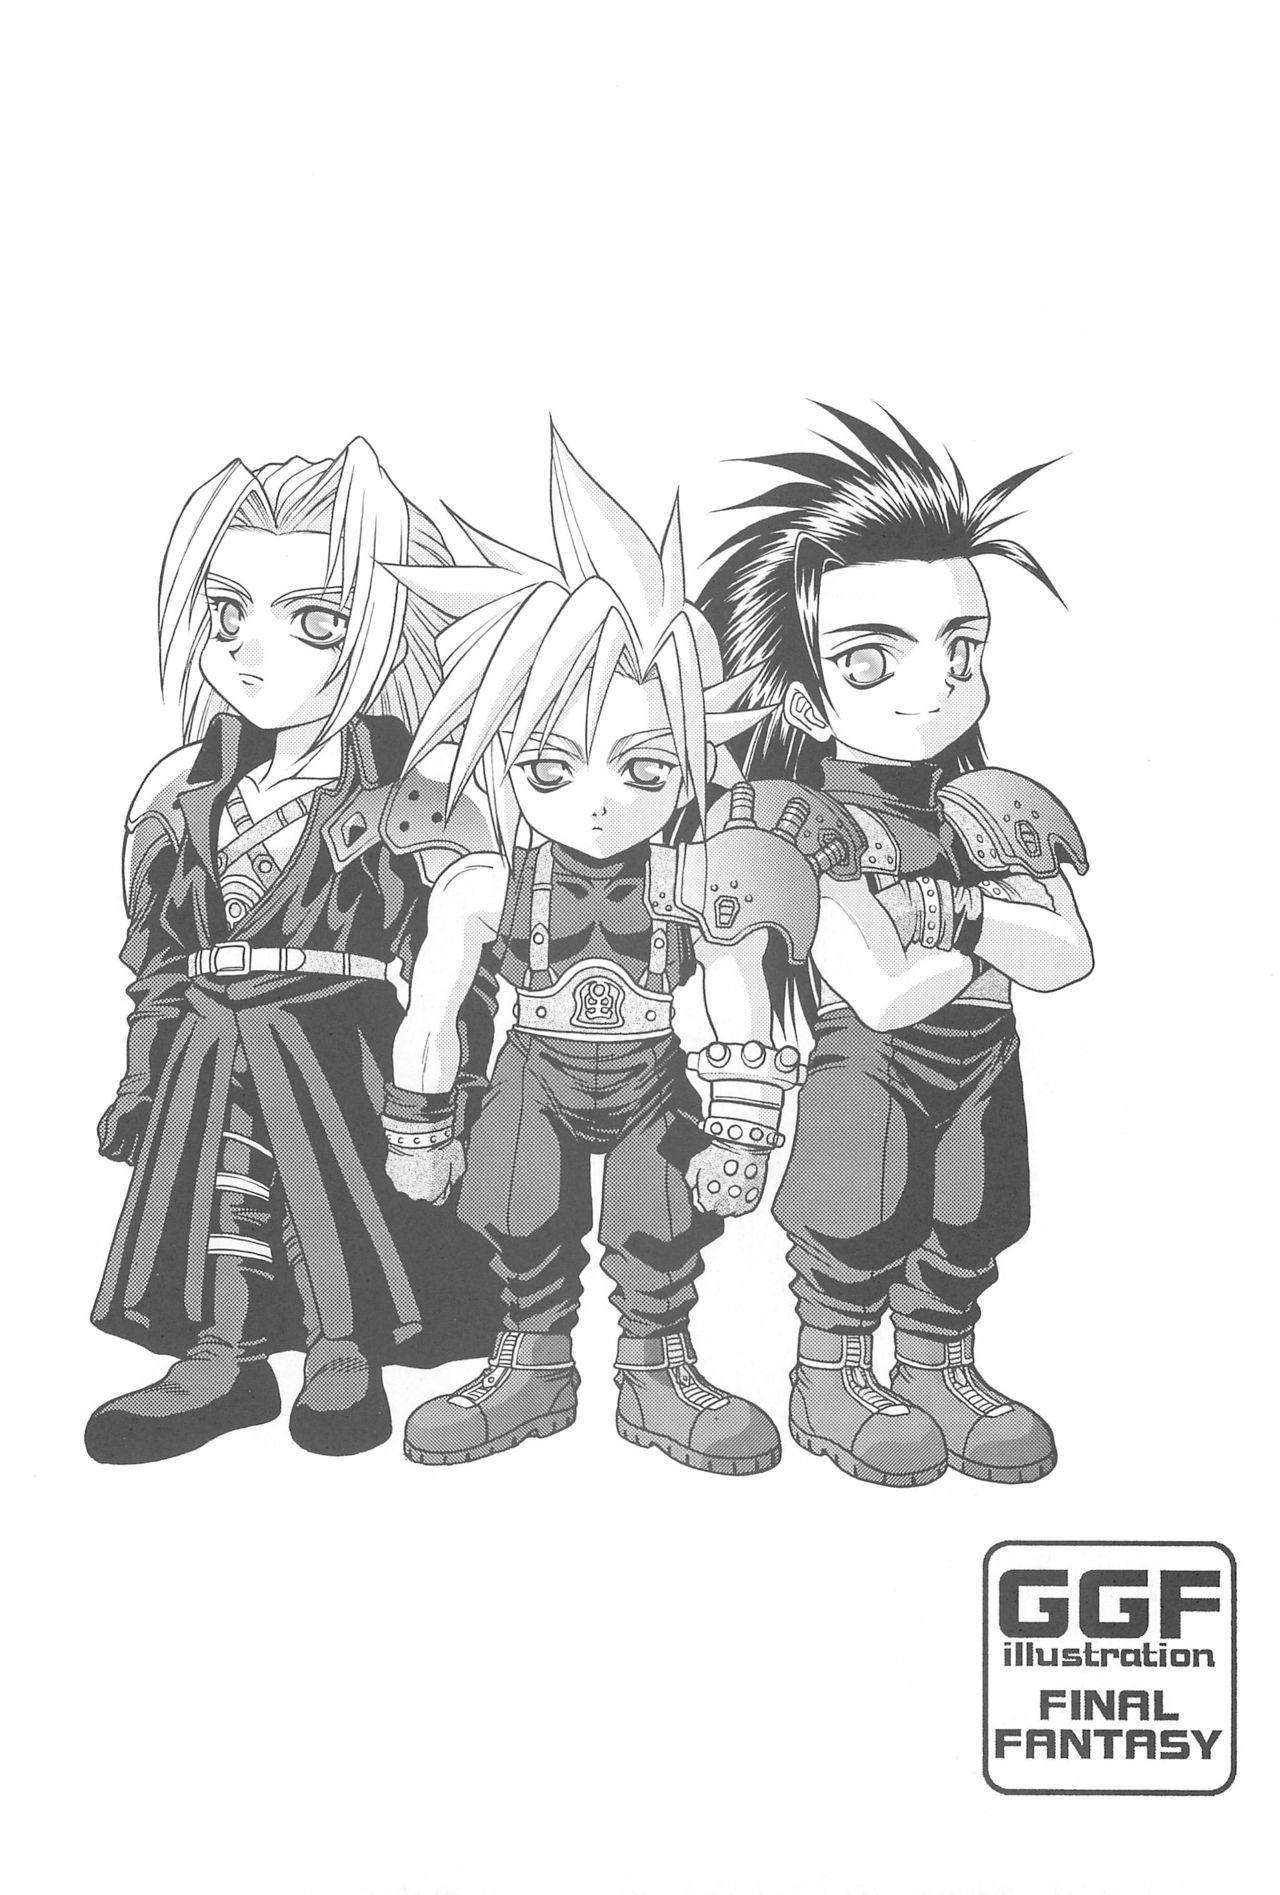 Game Giga Fantasy 3 41